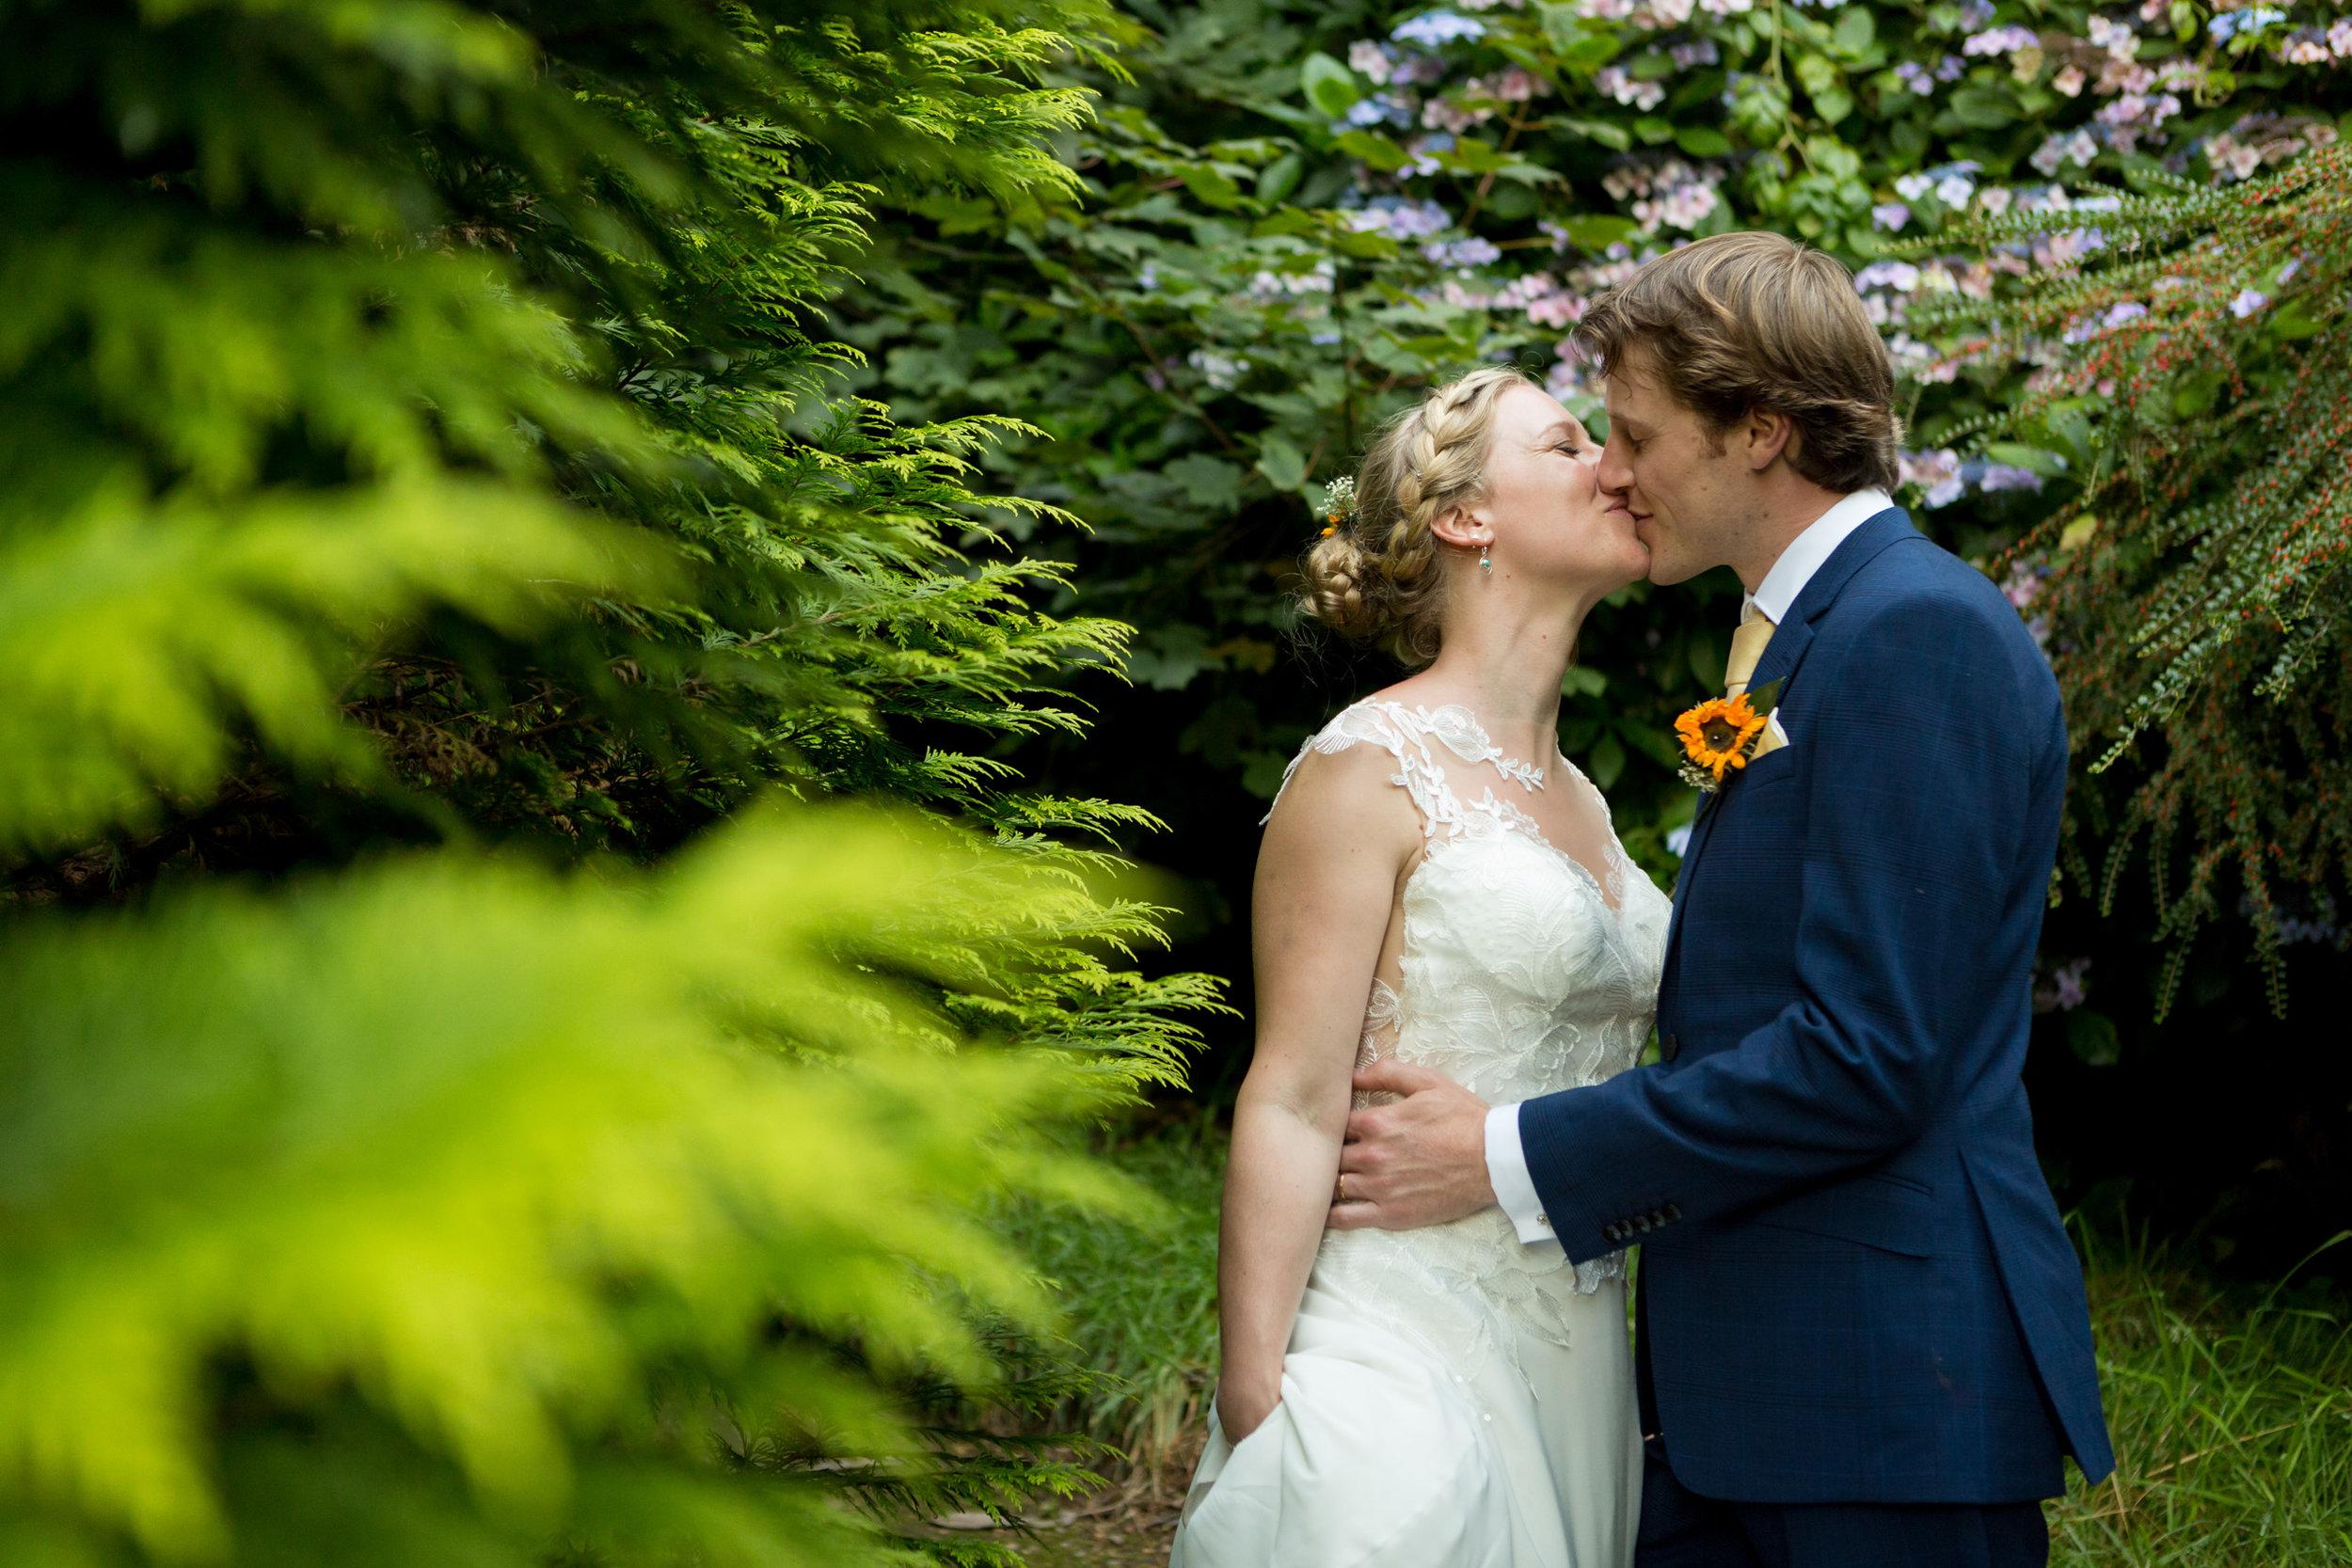 Bucklands-Tout-Saints-Hotel-Devon-Wedding-Photography-35.jpg